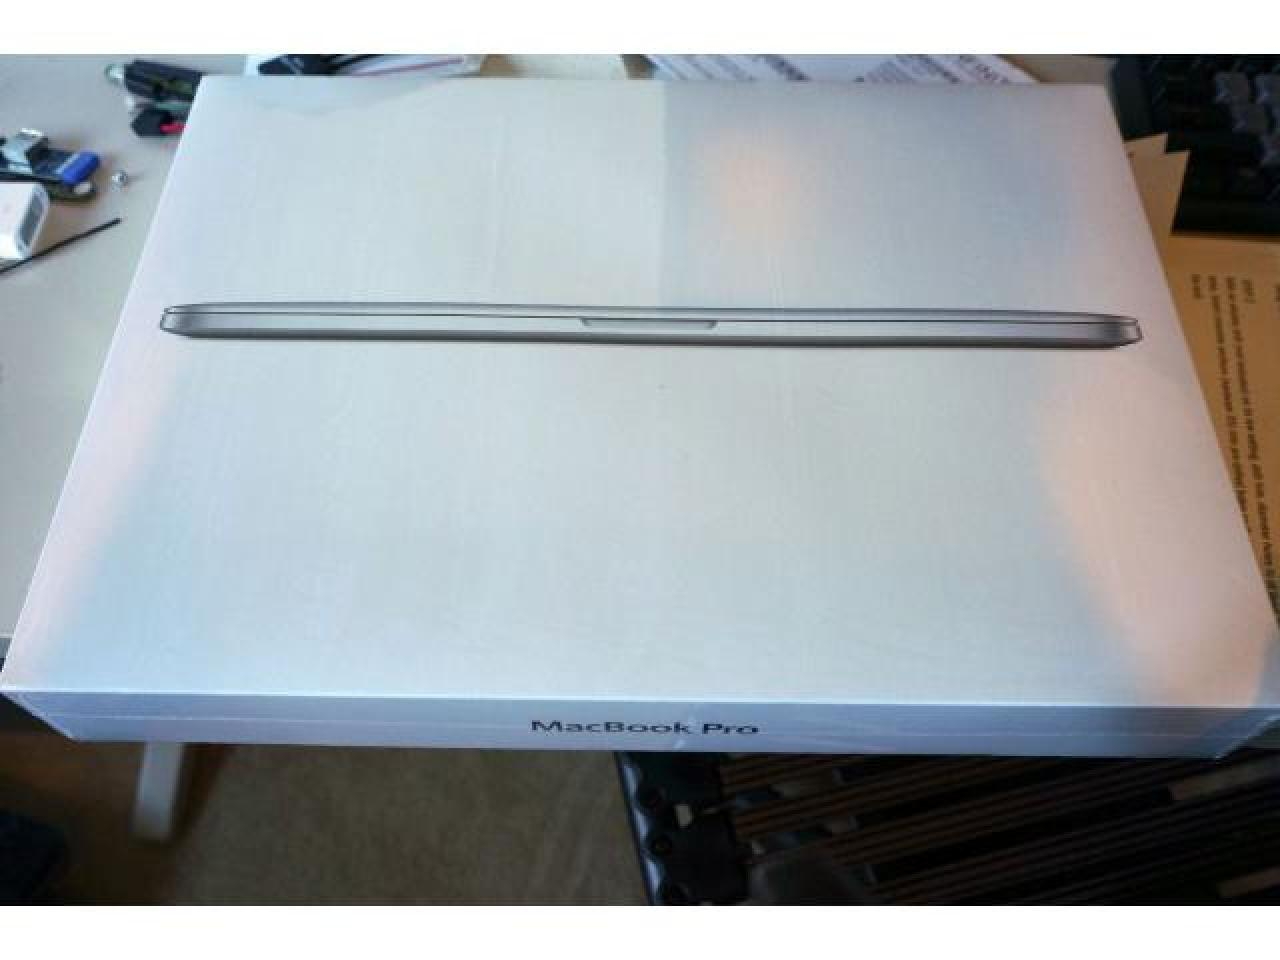 2015 Apple Macbook Pro 15-inch: 2.2GHz with Retina display - 1